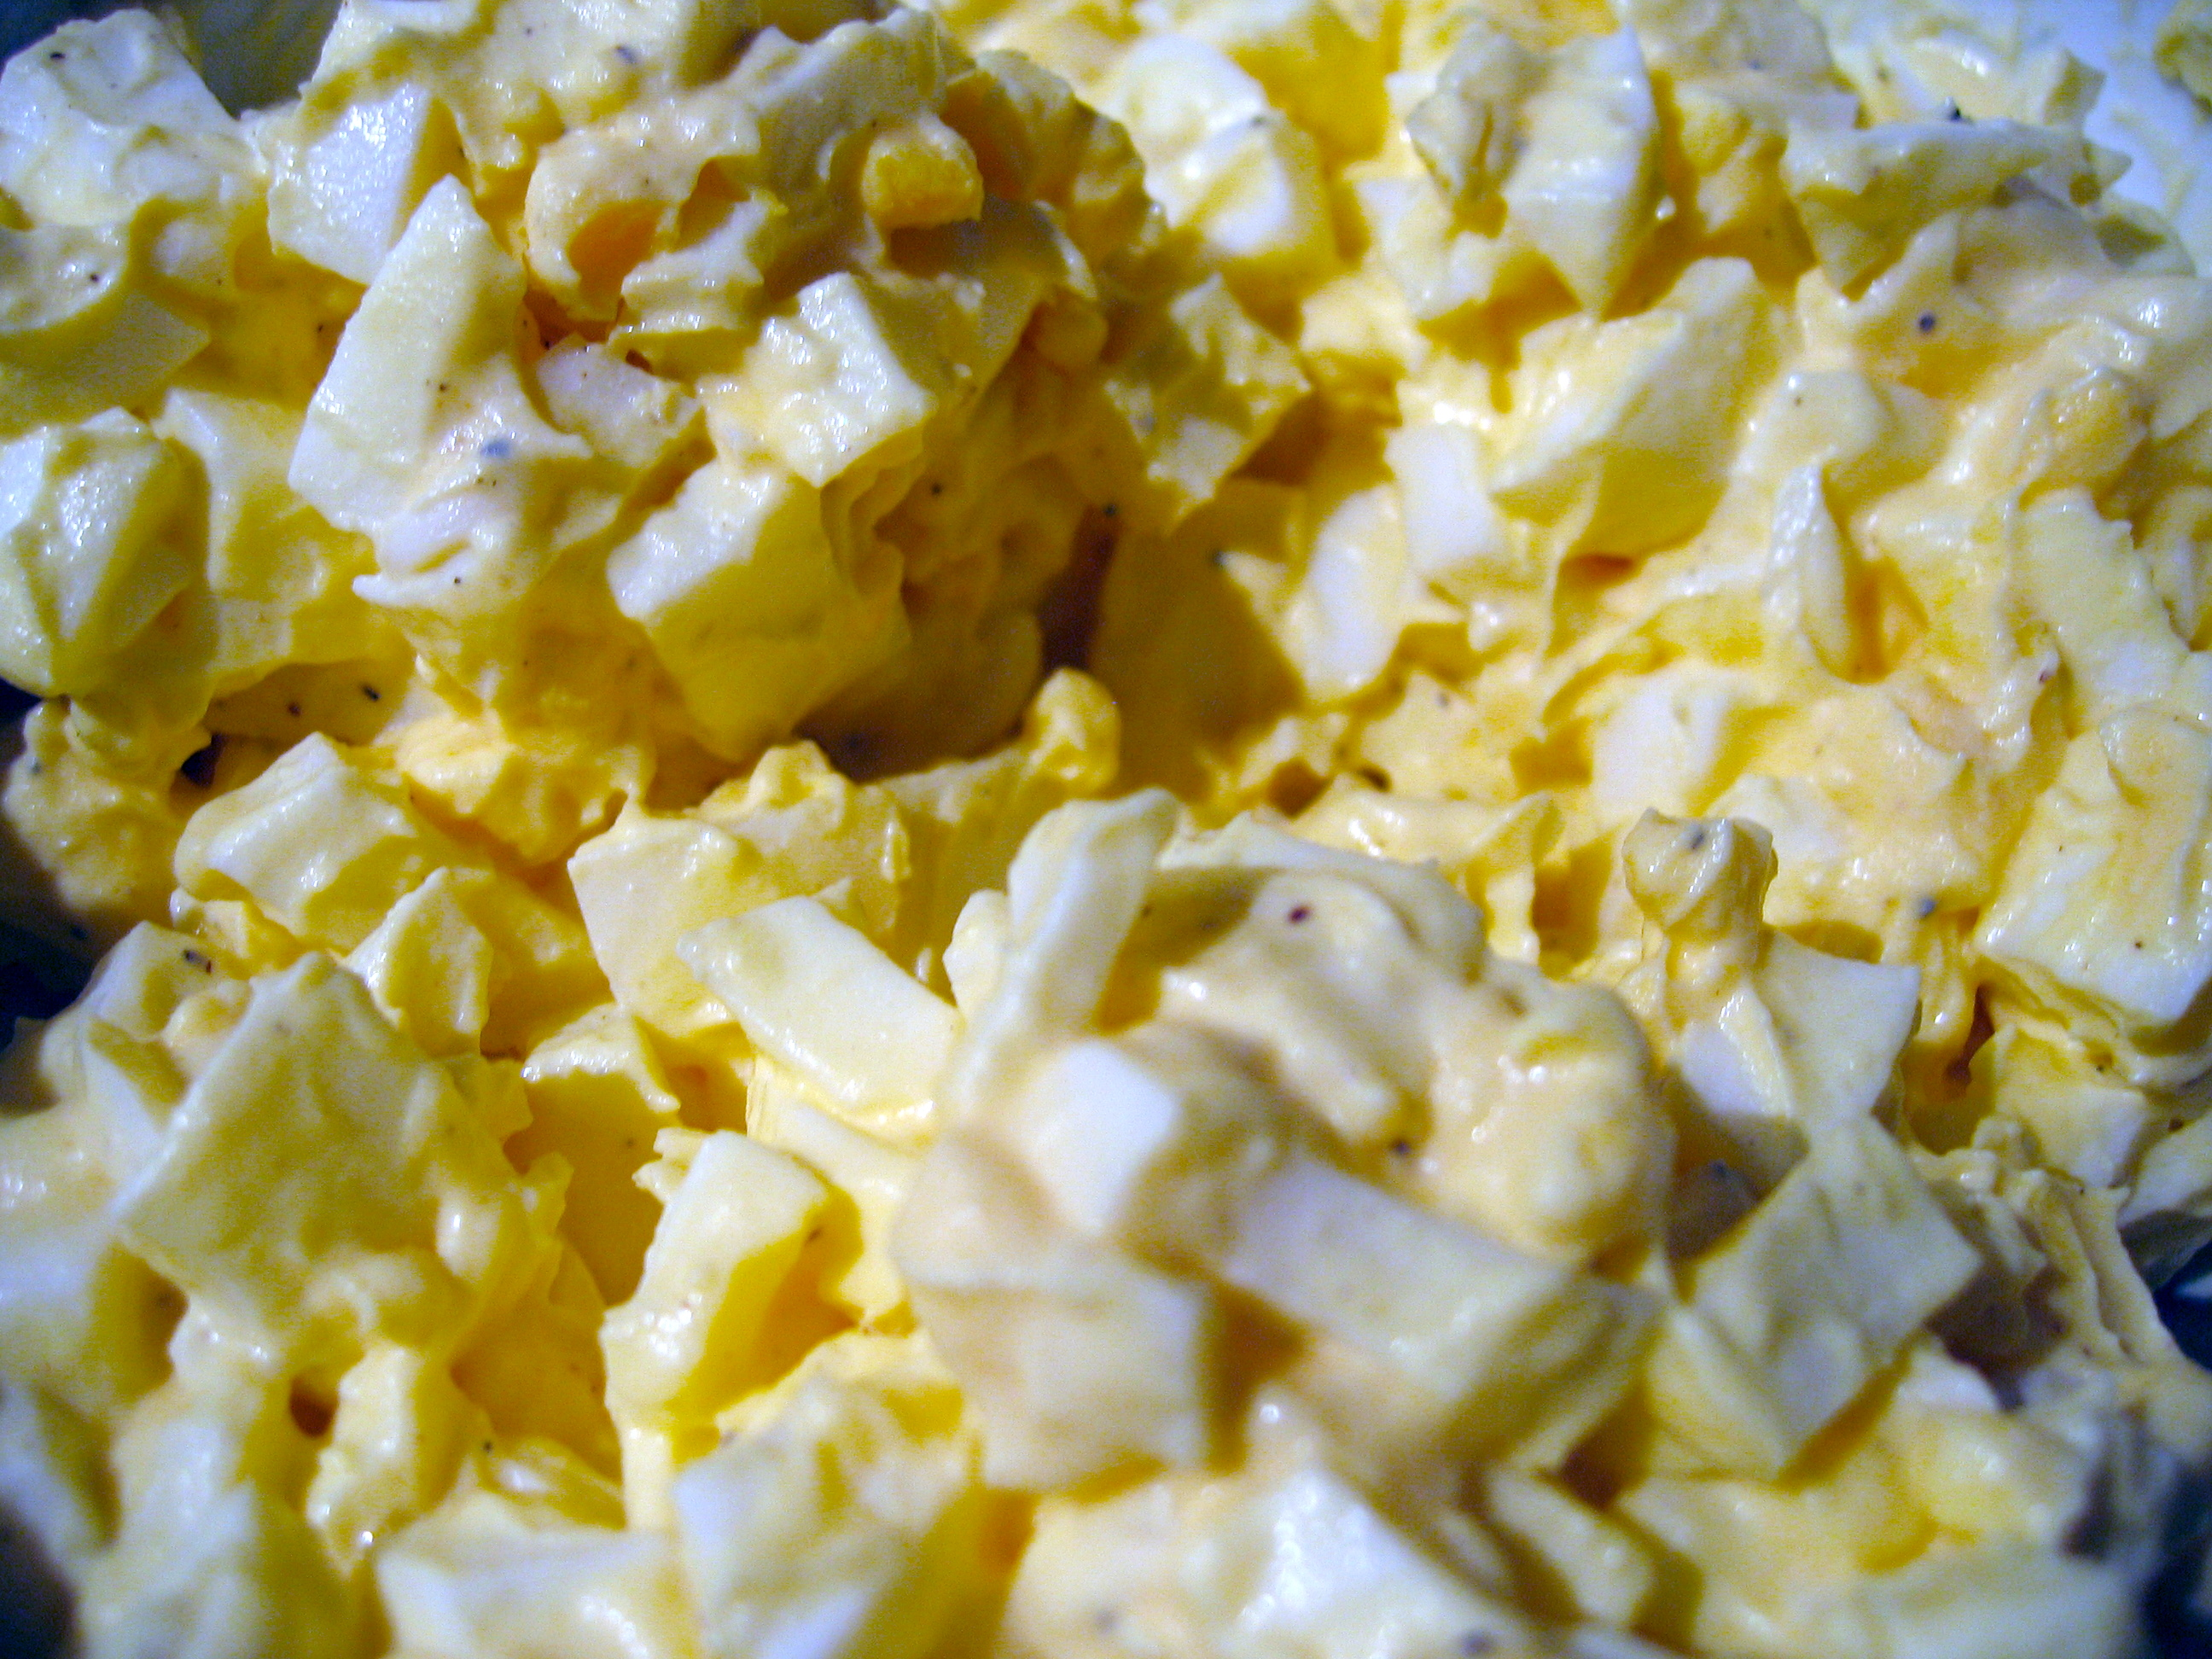 how to make egg salad 2 eggs